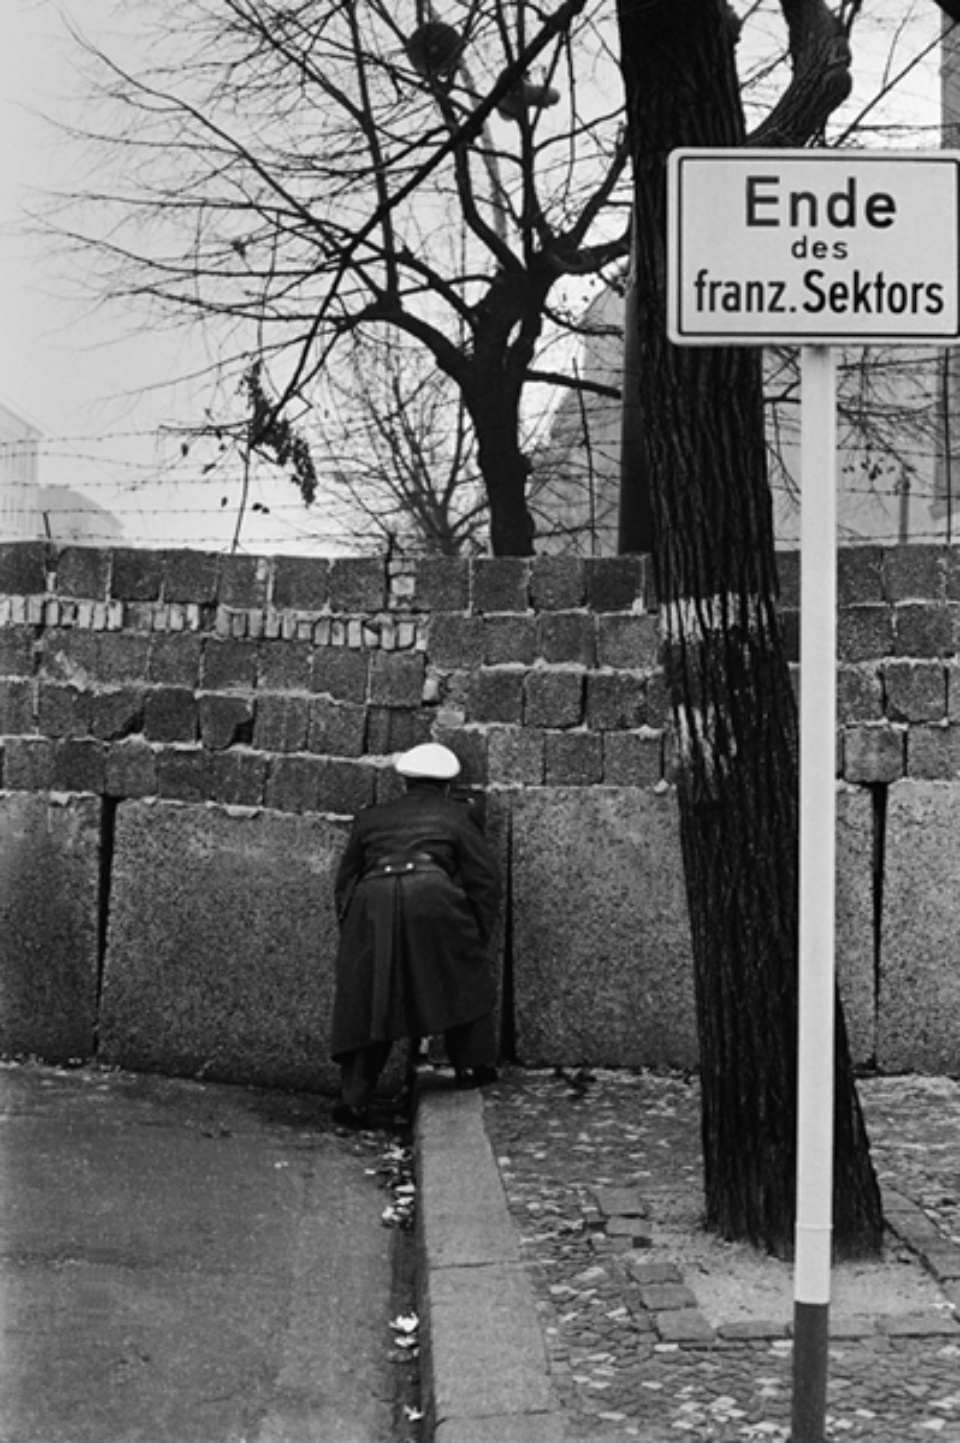 Jürgen Schadeberg Peeping cop Berlin, 1961 Signed and titled Gelatin silver print